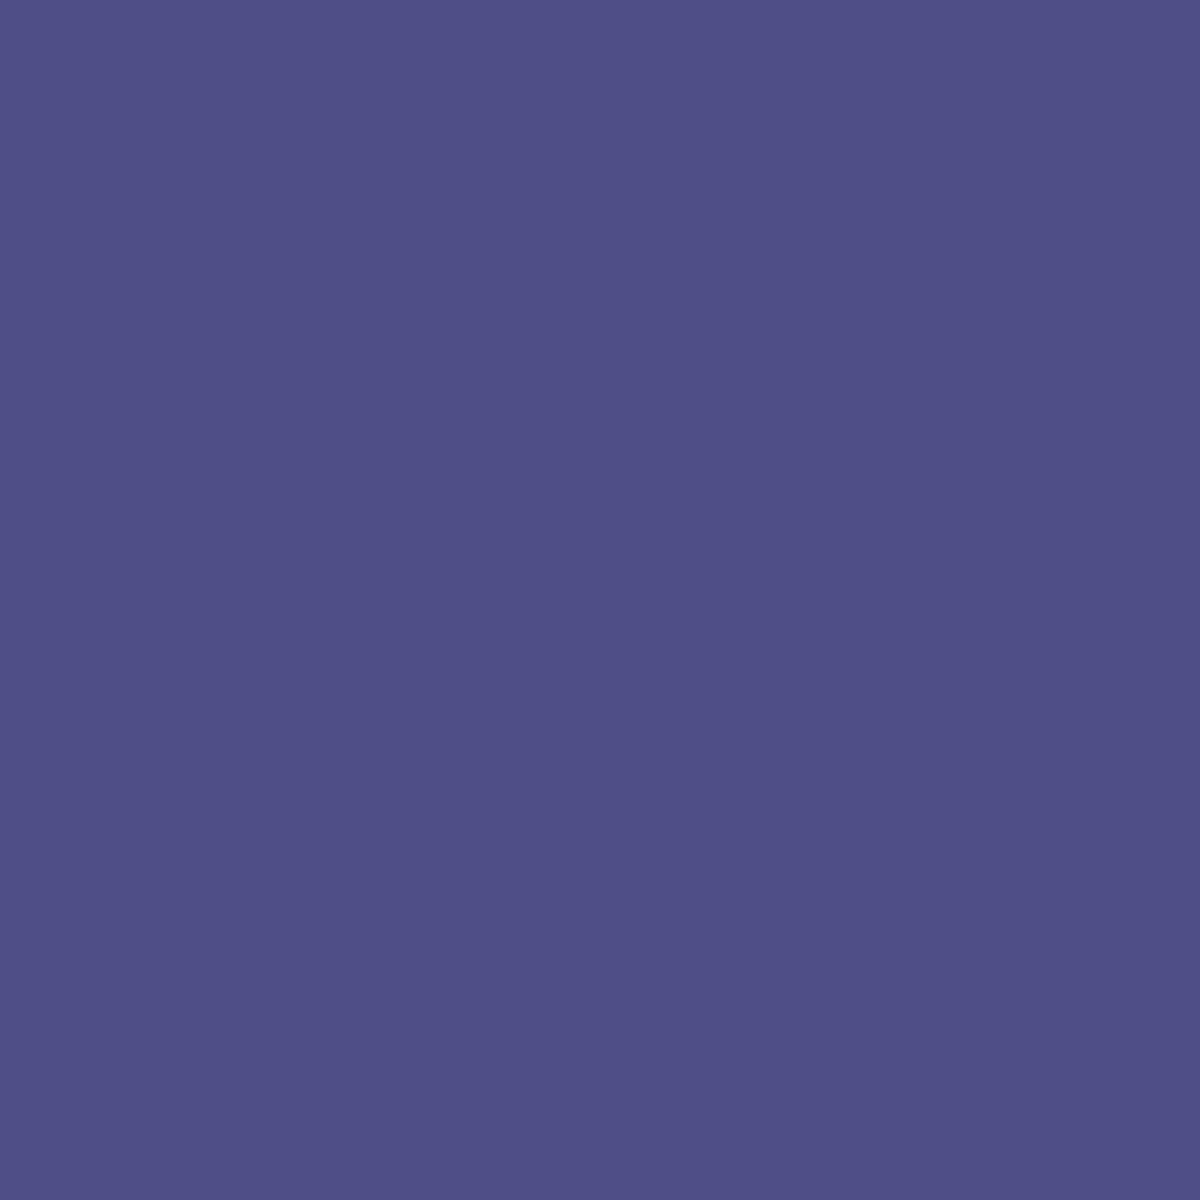 Organicline (10 ml) - PIGMENTS AMIEA ORGANICLINE SAPPHIRE, Flacon 10 ml